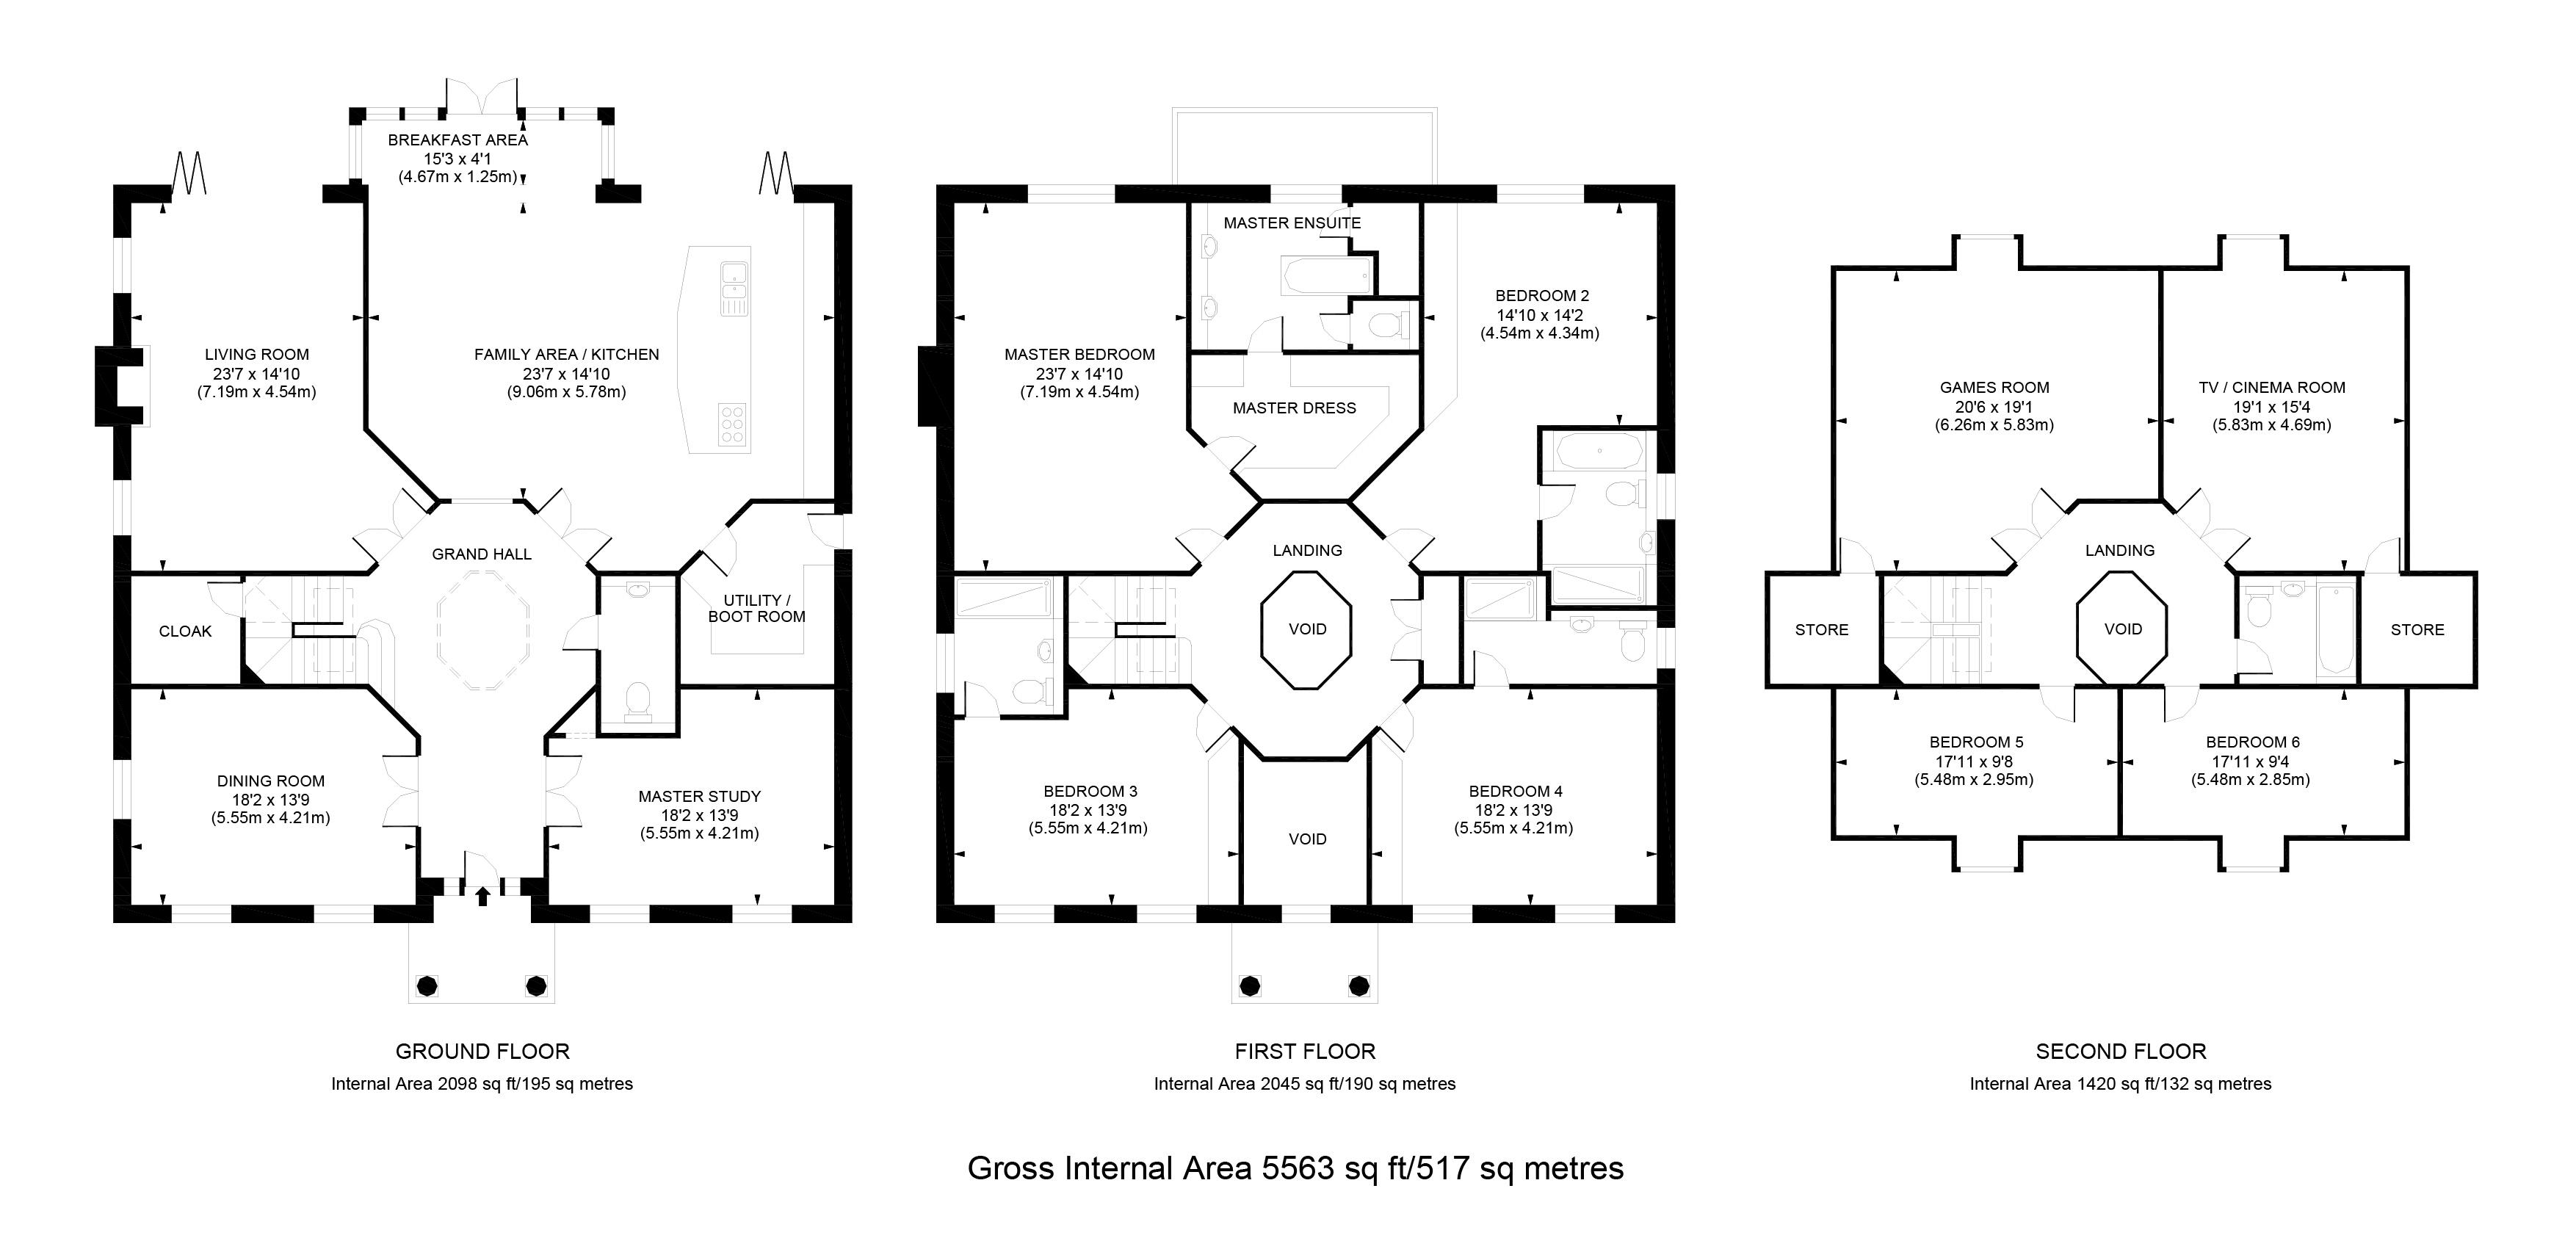 Megaflo Wiring Diagram Y Plan : Trendy megaflo system wiring diagram capacitor